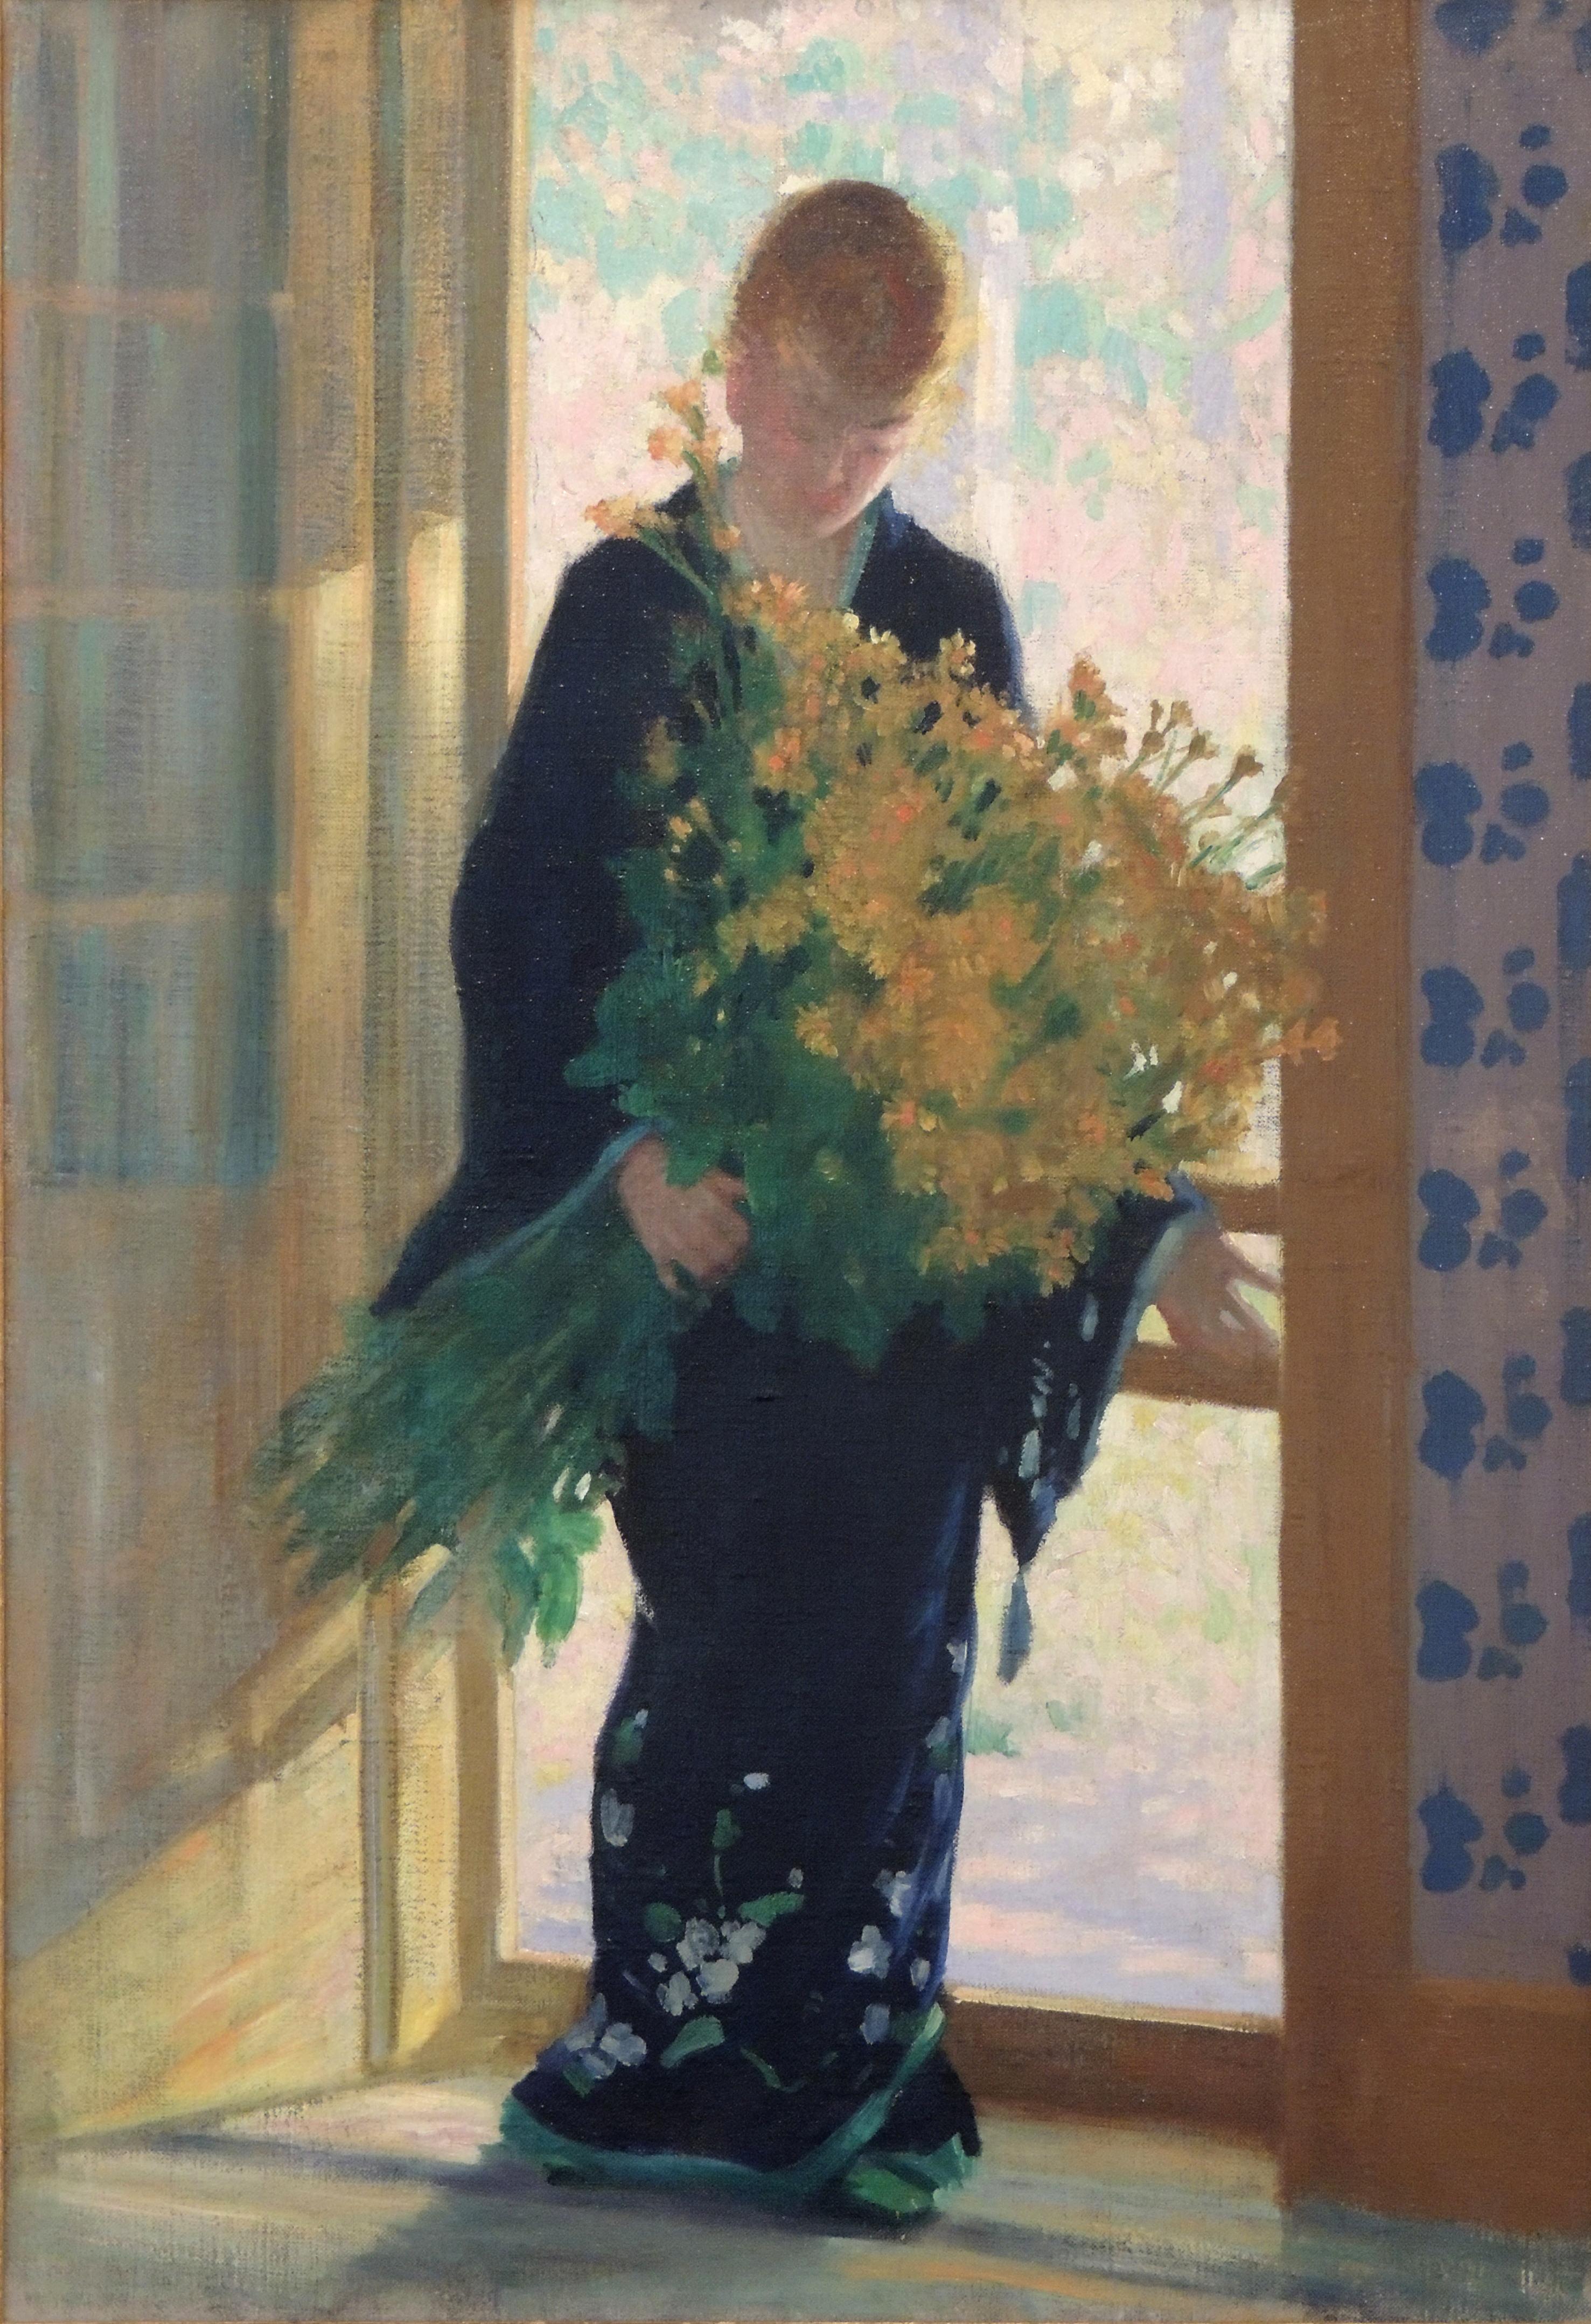 "James R. Hopkins | FRESH FLOWERS | oil on canvas | 26 x 22"" | c.1920 | Anne S. Davidson"